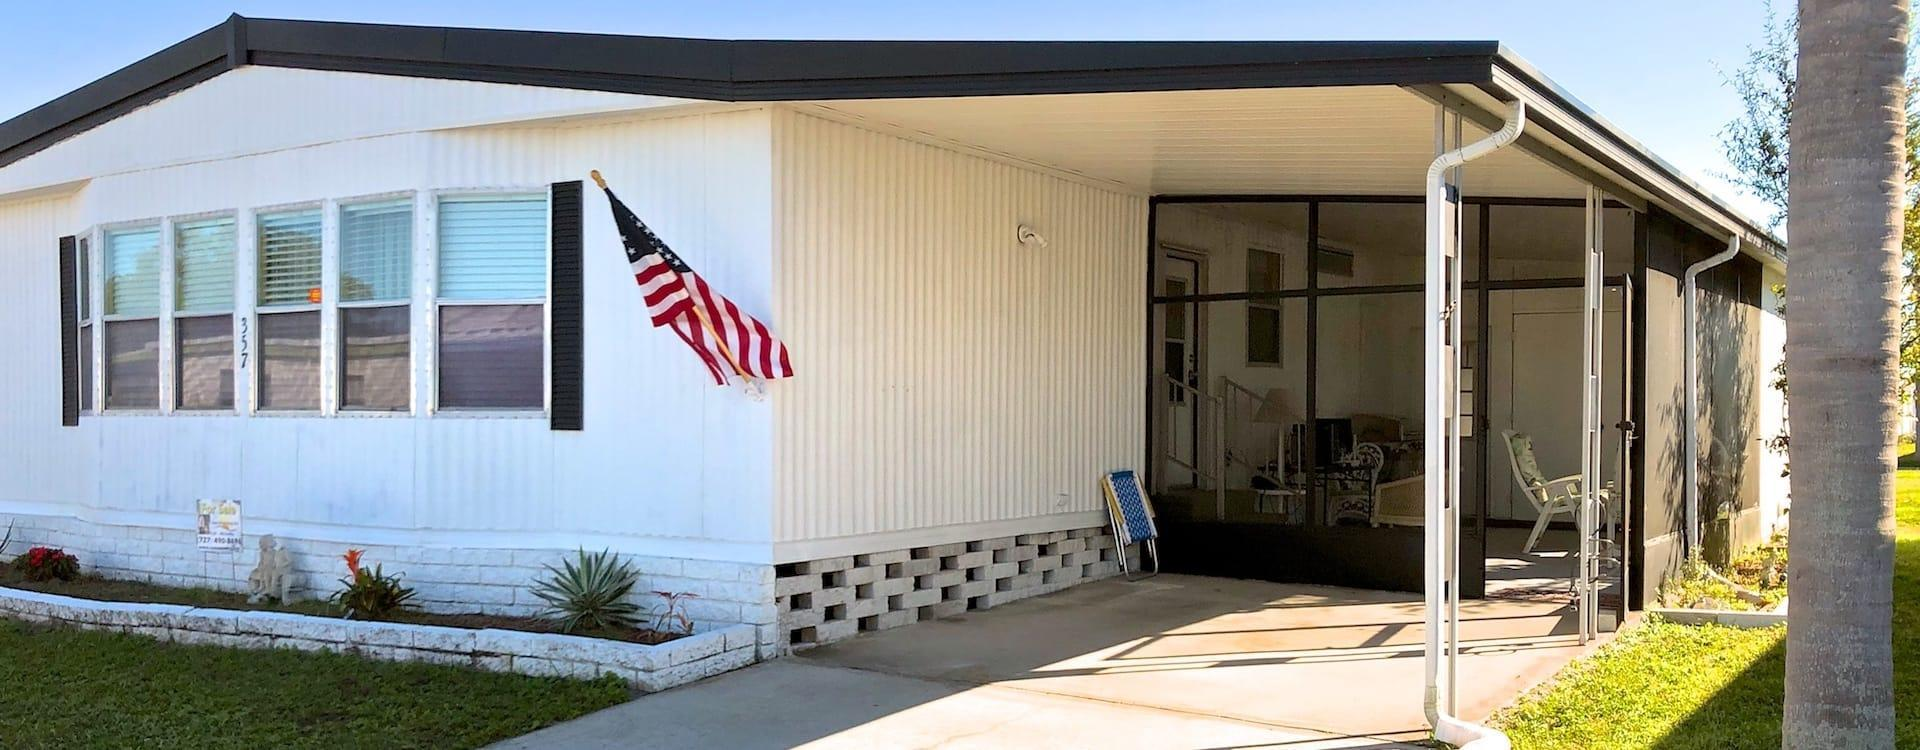 Mobile Home For Sale Clearwater Fl La Plaza 357